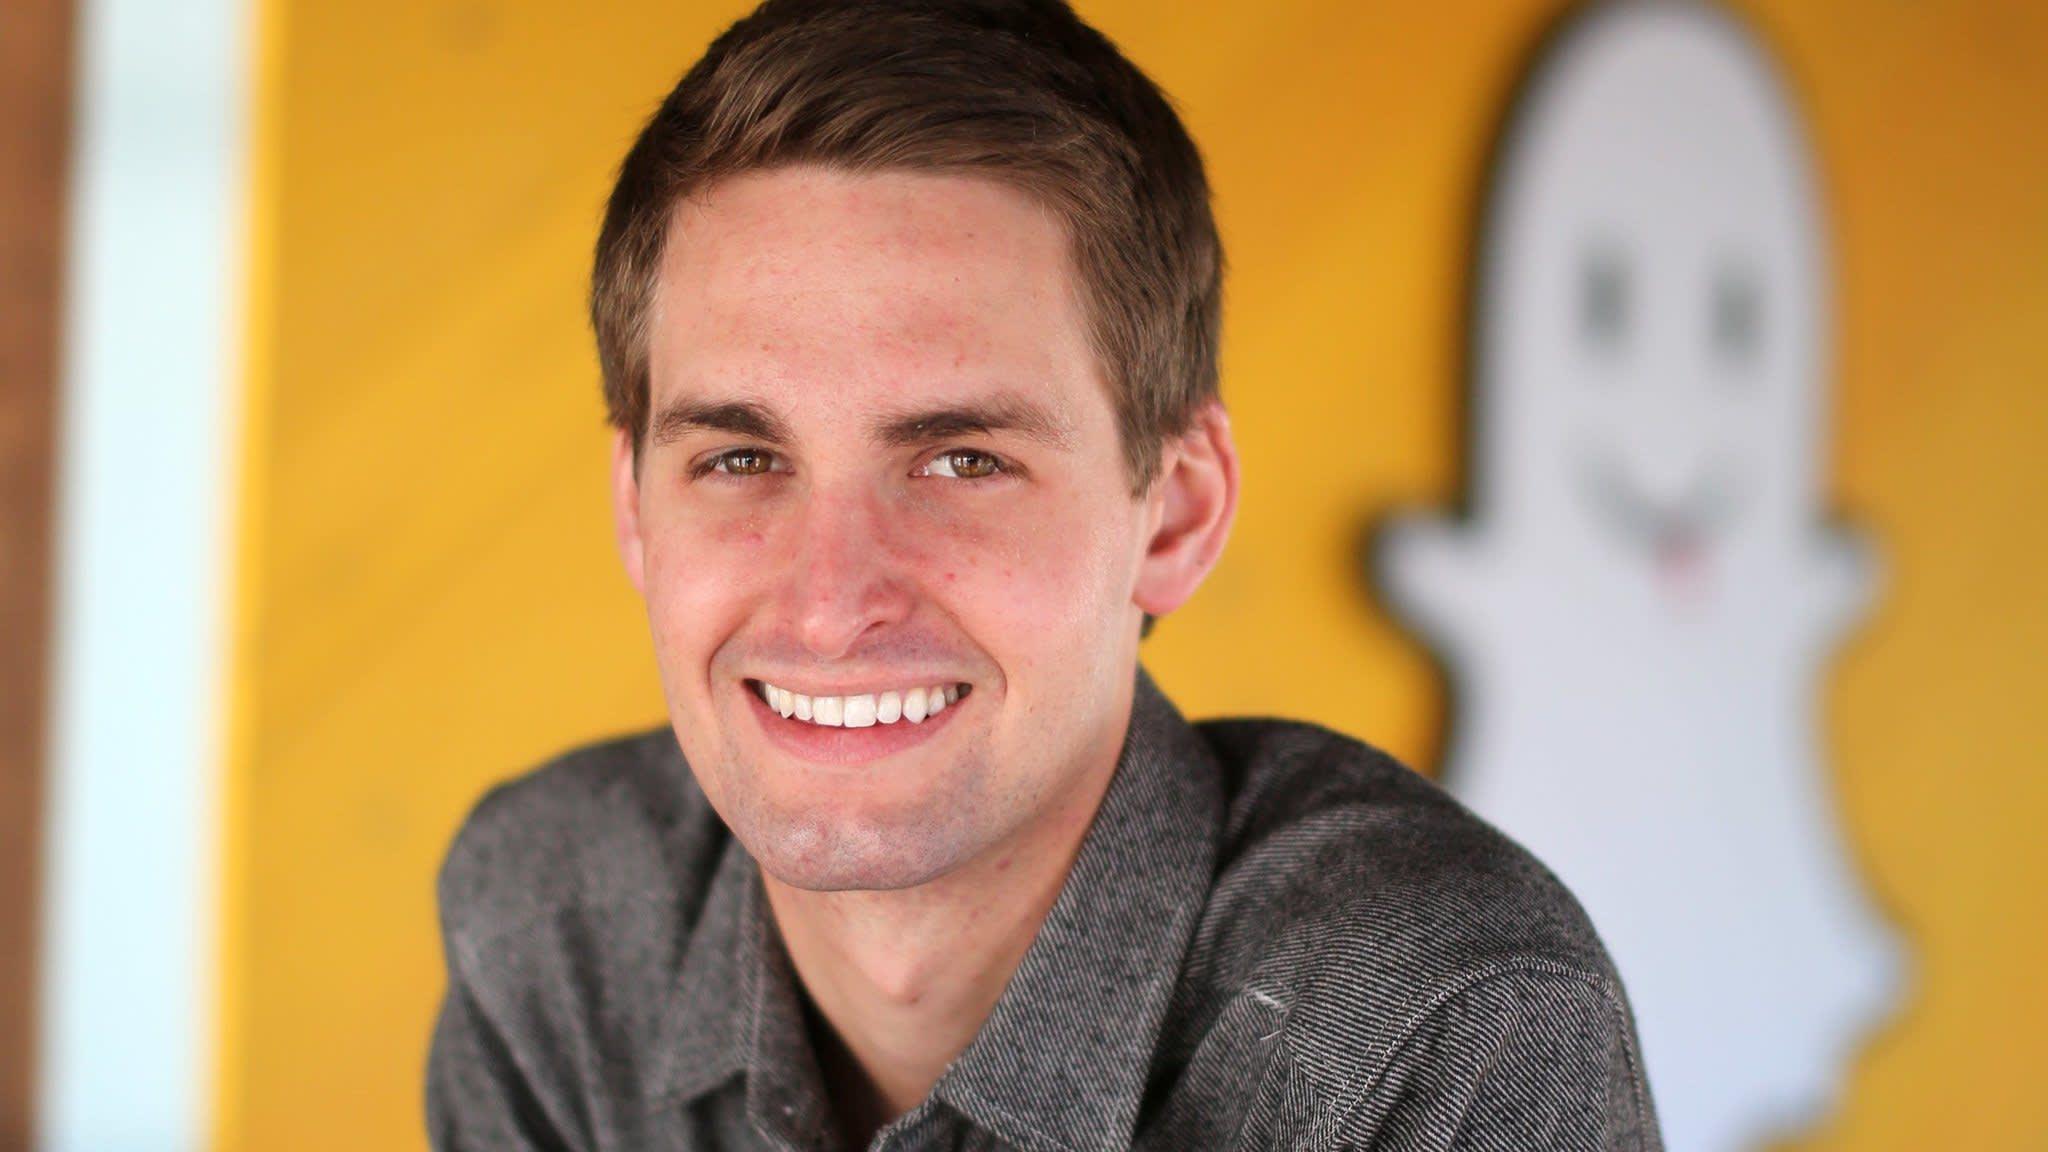 Snapchat creator Evan Spiegel's pay hits $638m